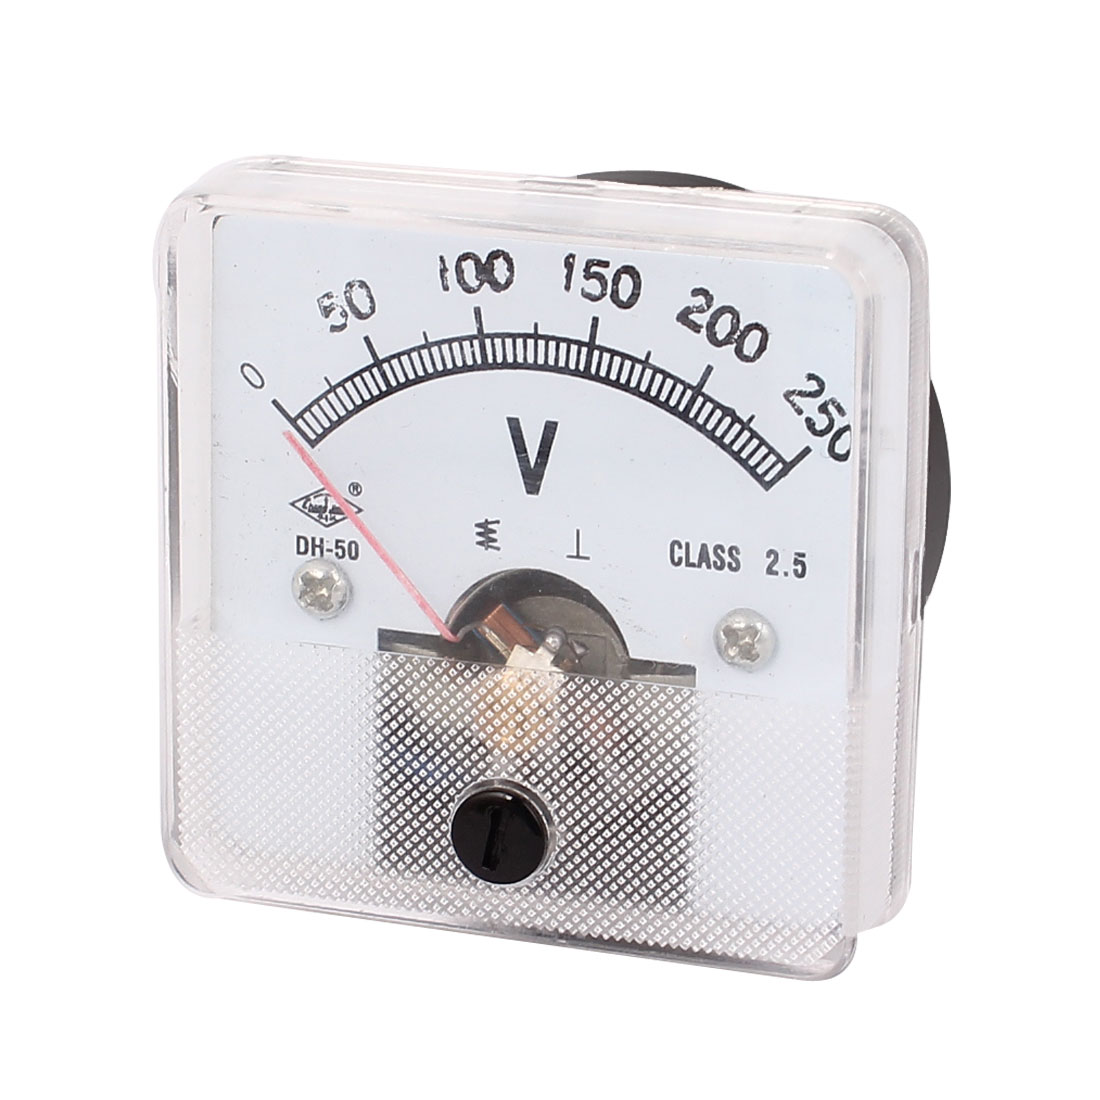 DH-50 AC 0-250V 2.5 Class Square Plastic Panel Gauge Analog Voltmeter Voltage Meter